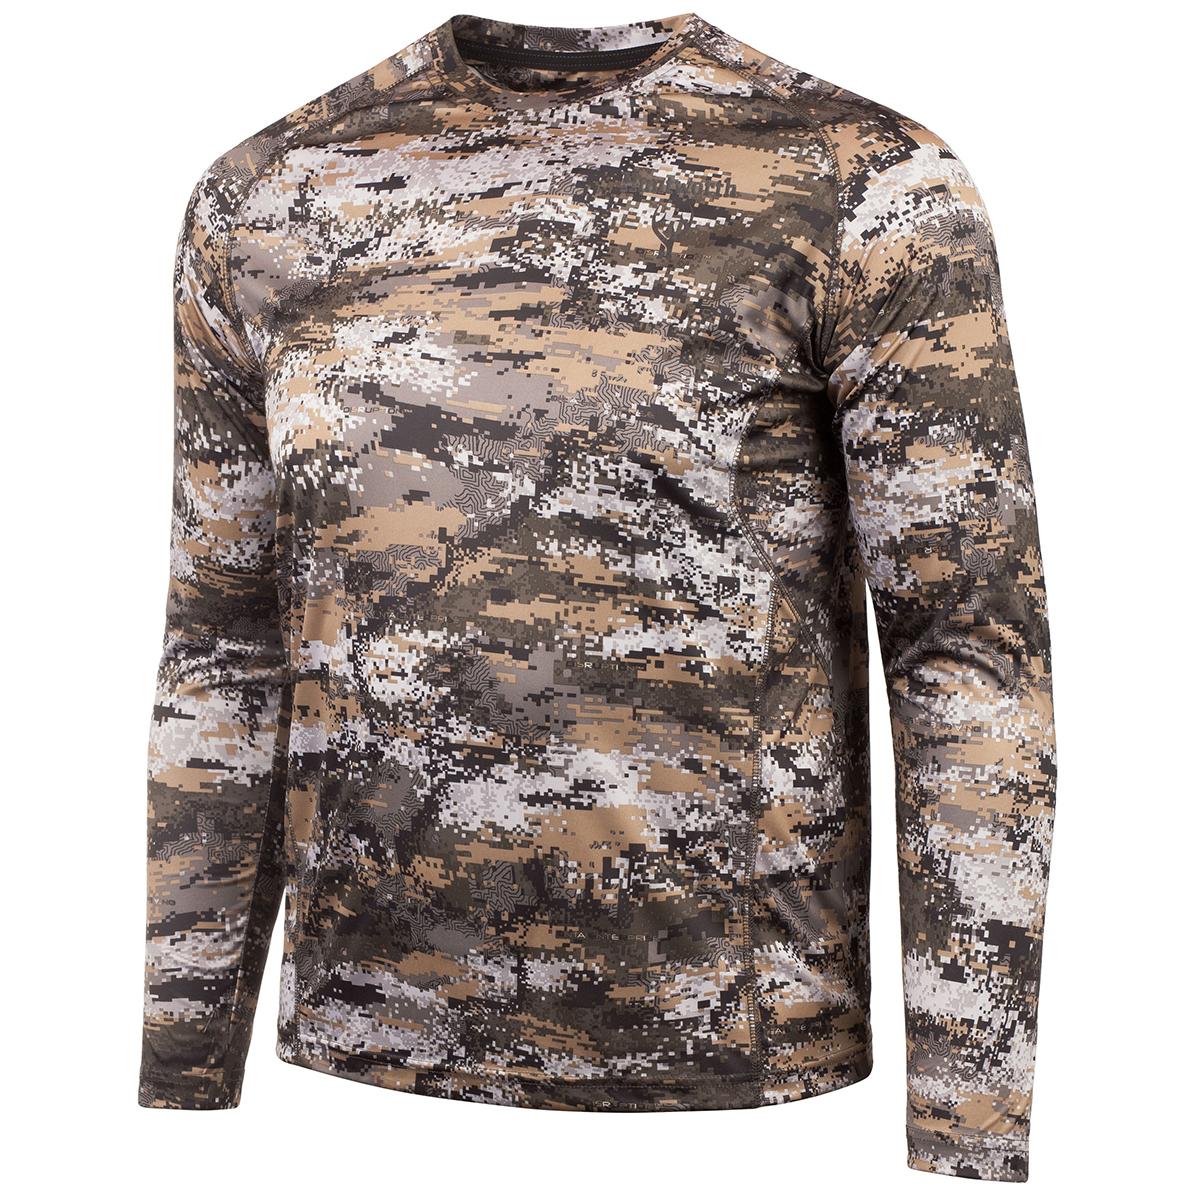 Huntworth Men's Long-Sleeve Hunting Shirt, Disruption Camo